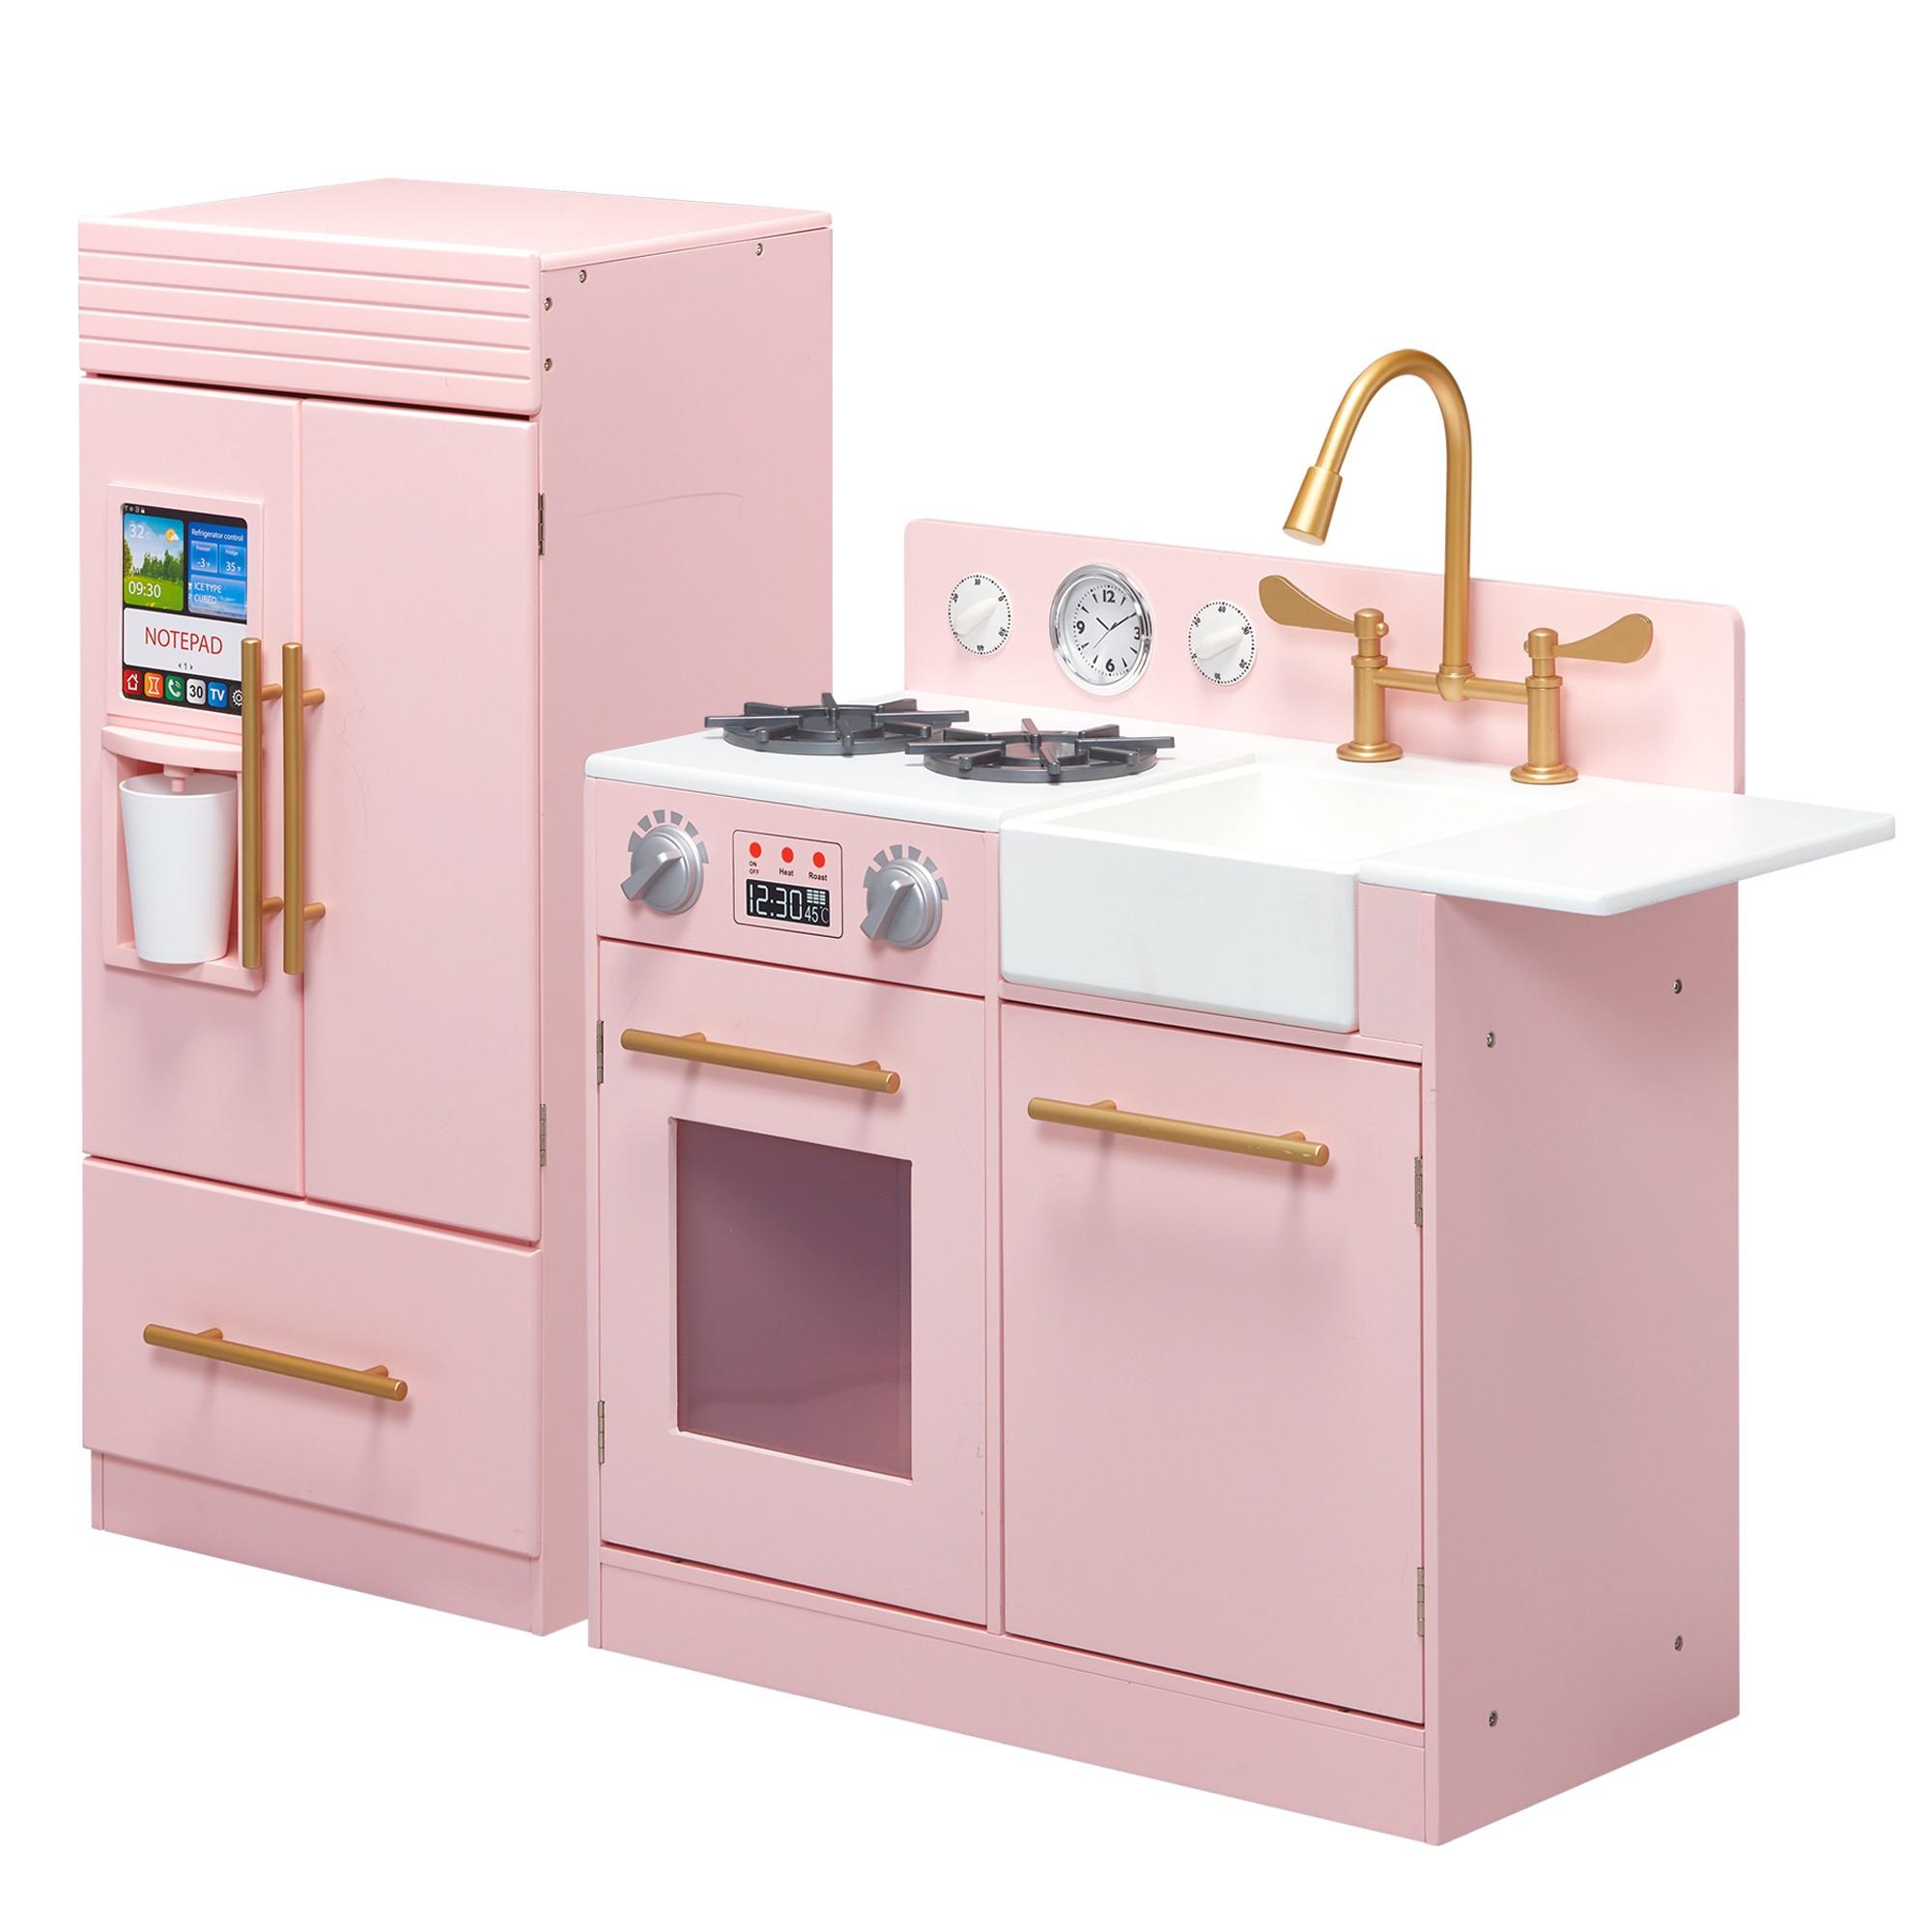 ff88d34506a Teamson Kids Urban Luxury Play Kitchen - Pink